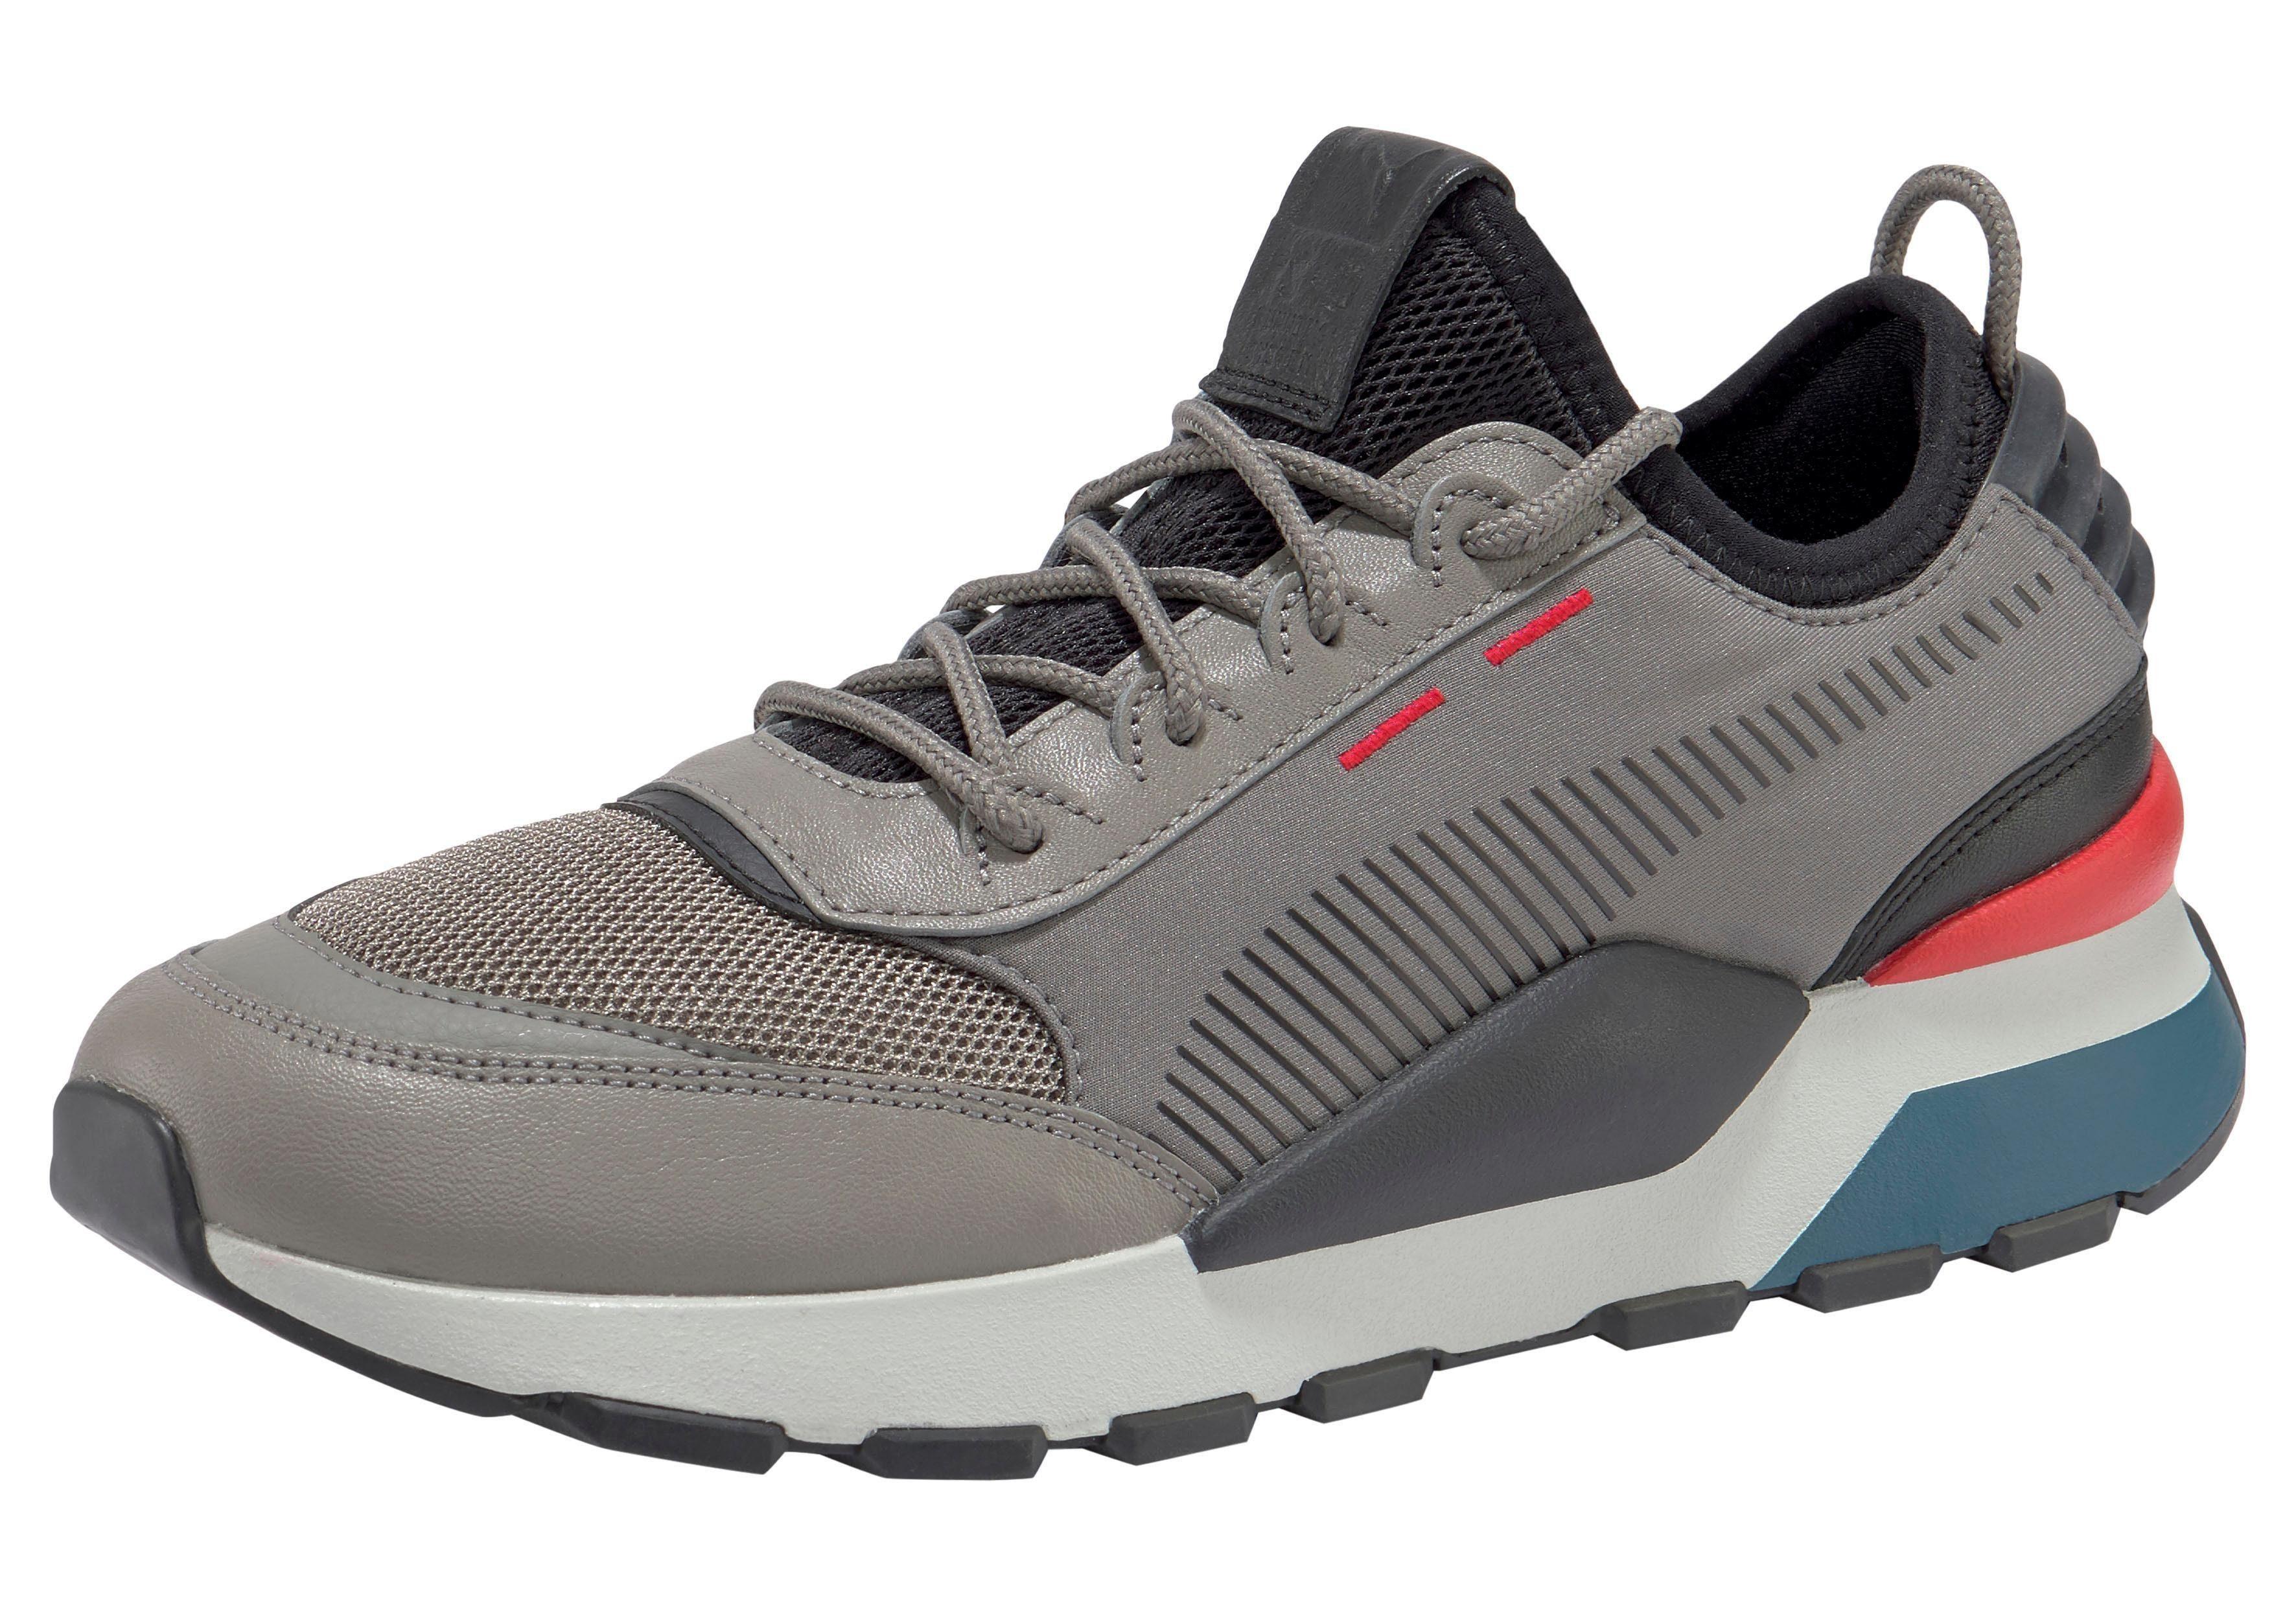 sneakers »RS O Tracks«